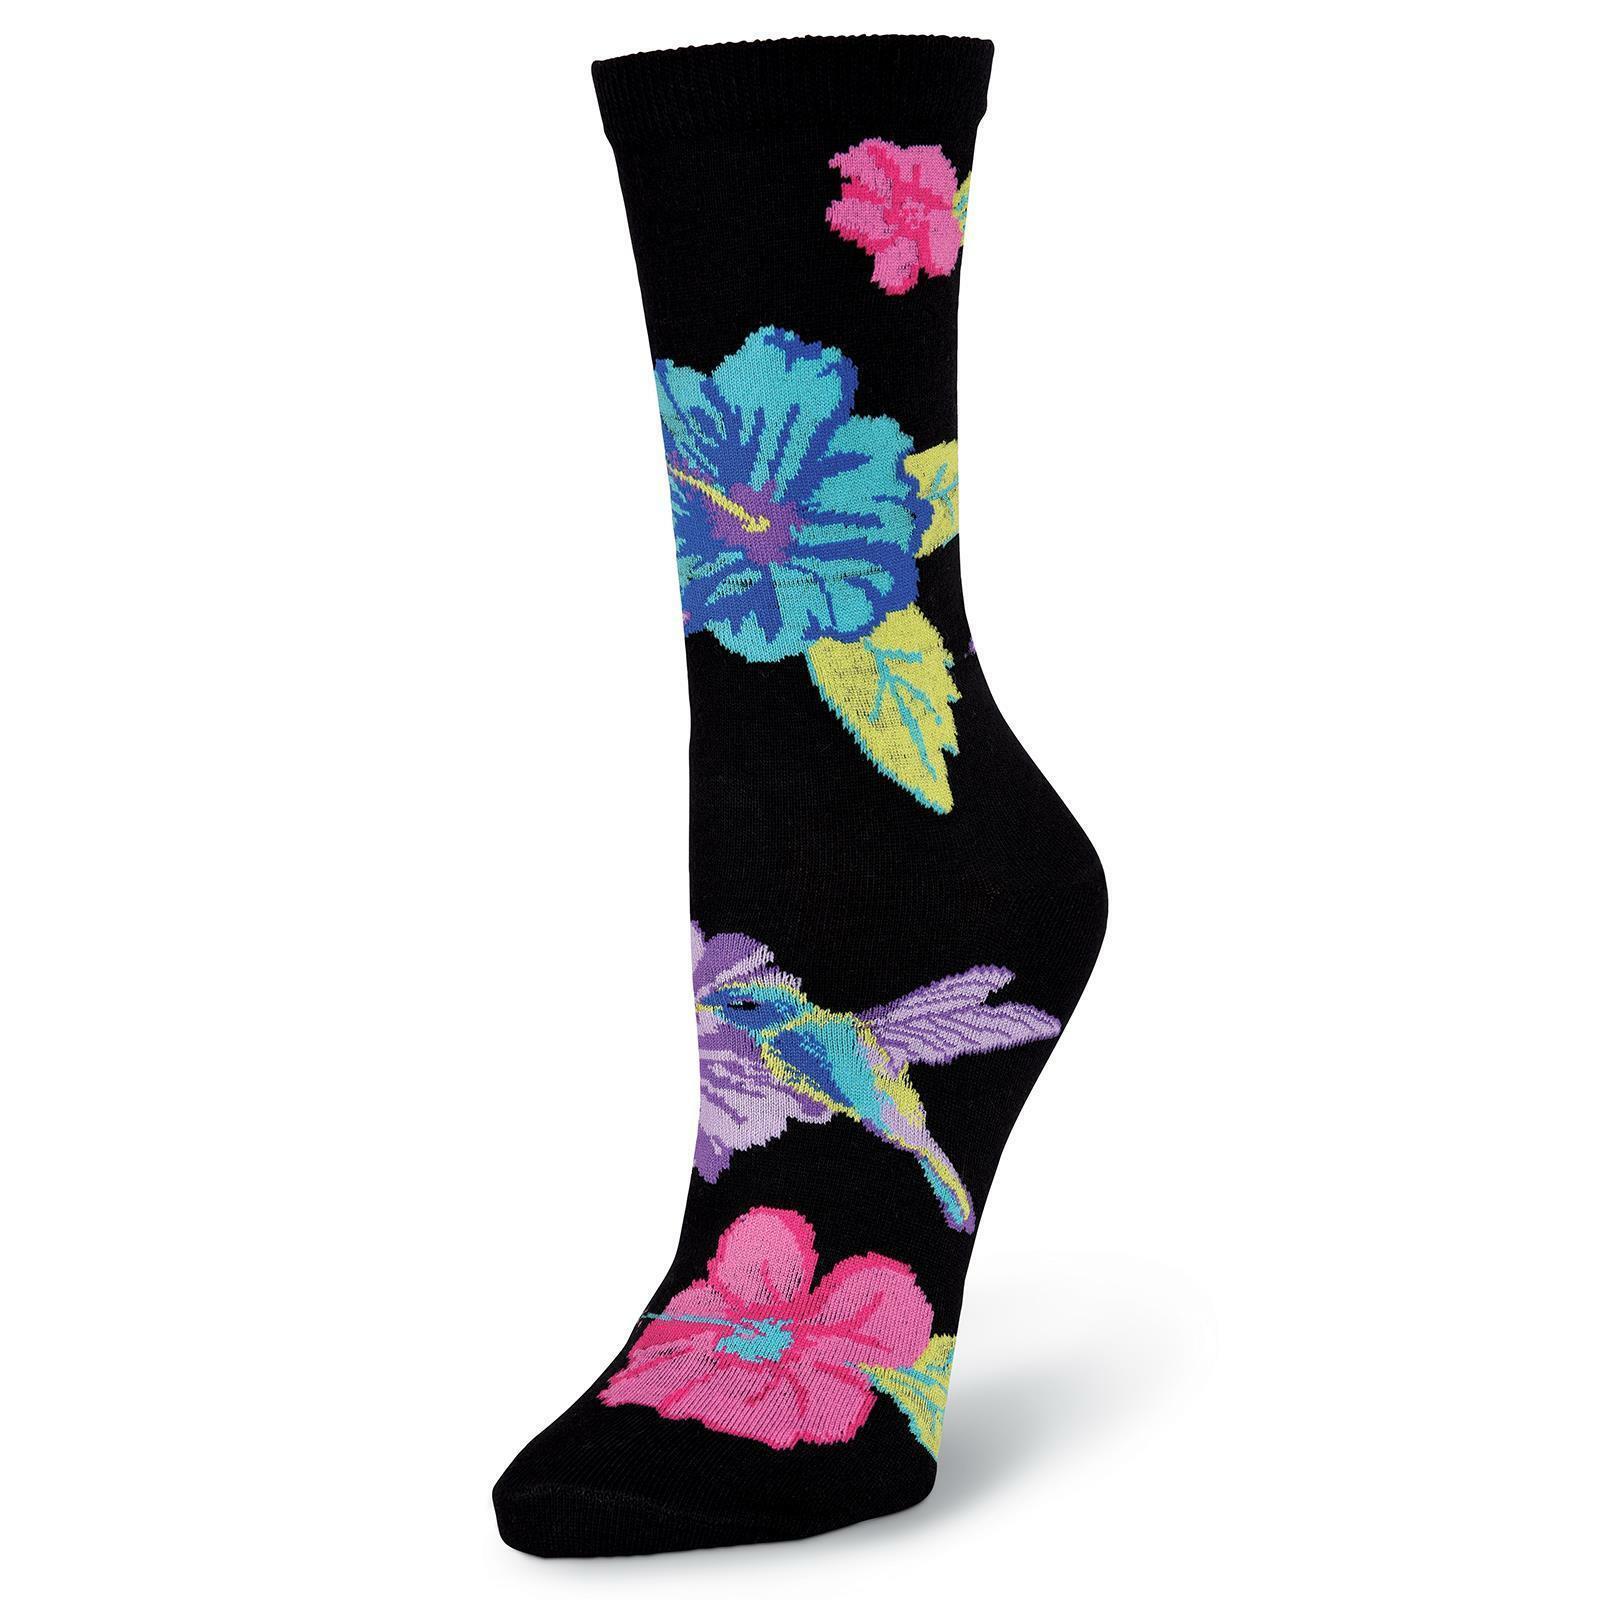 K.Bell Women's Hummingbirds Black Crew Socks fits shoe Size 4-10 Free Shipping